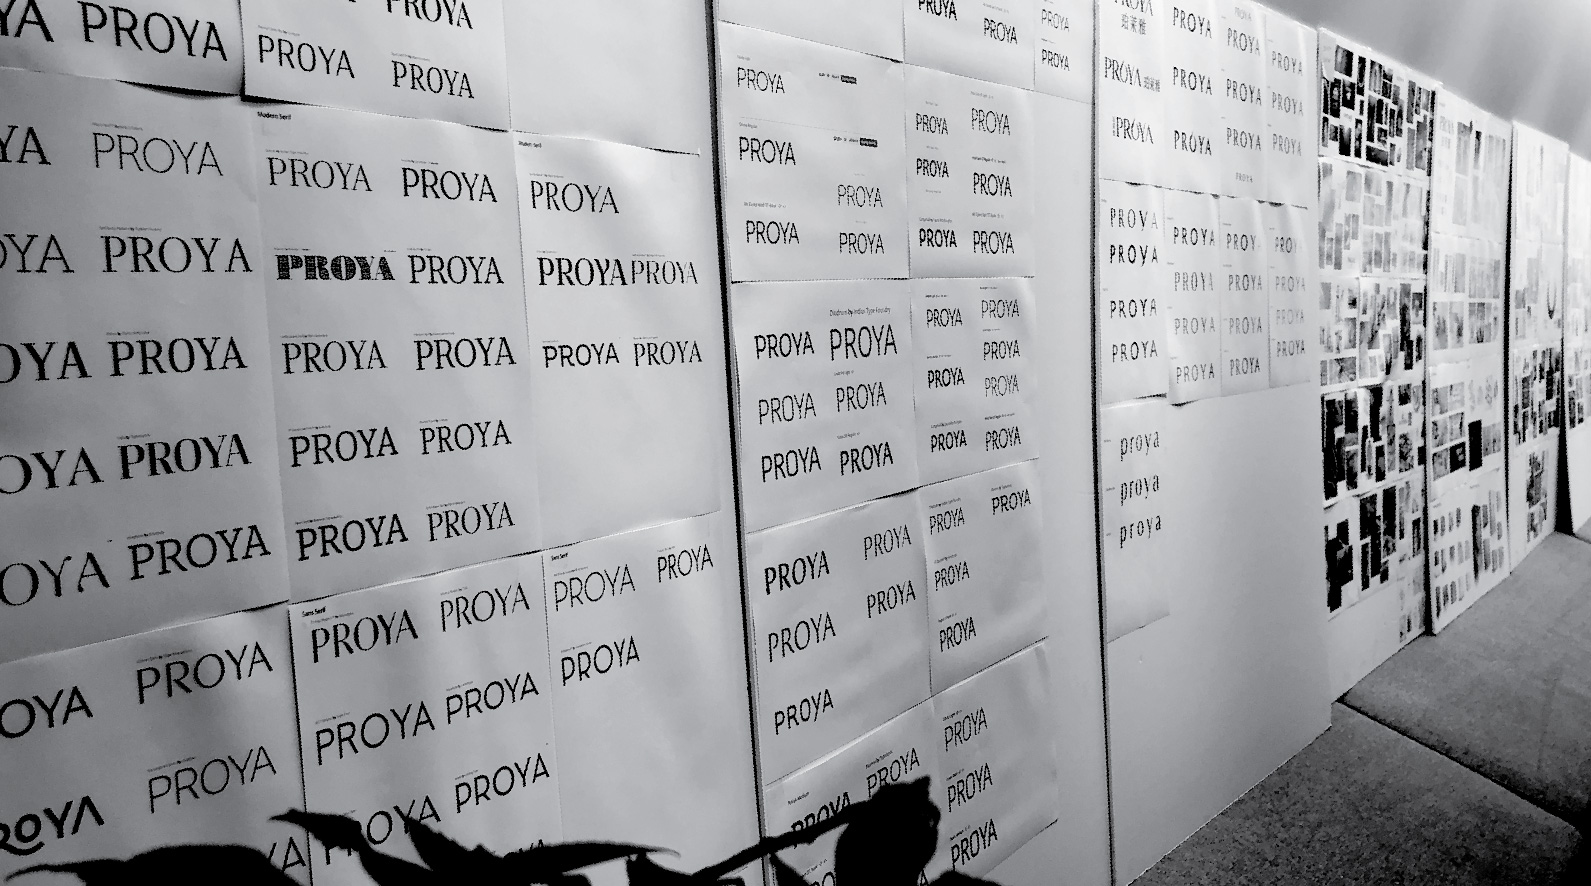 proya_03.jpg